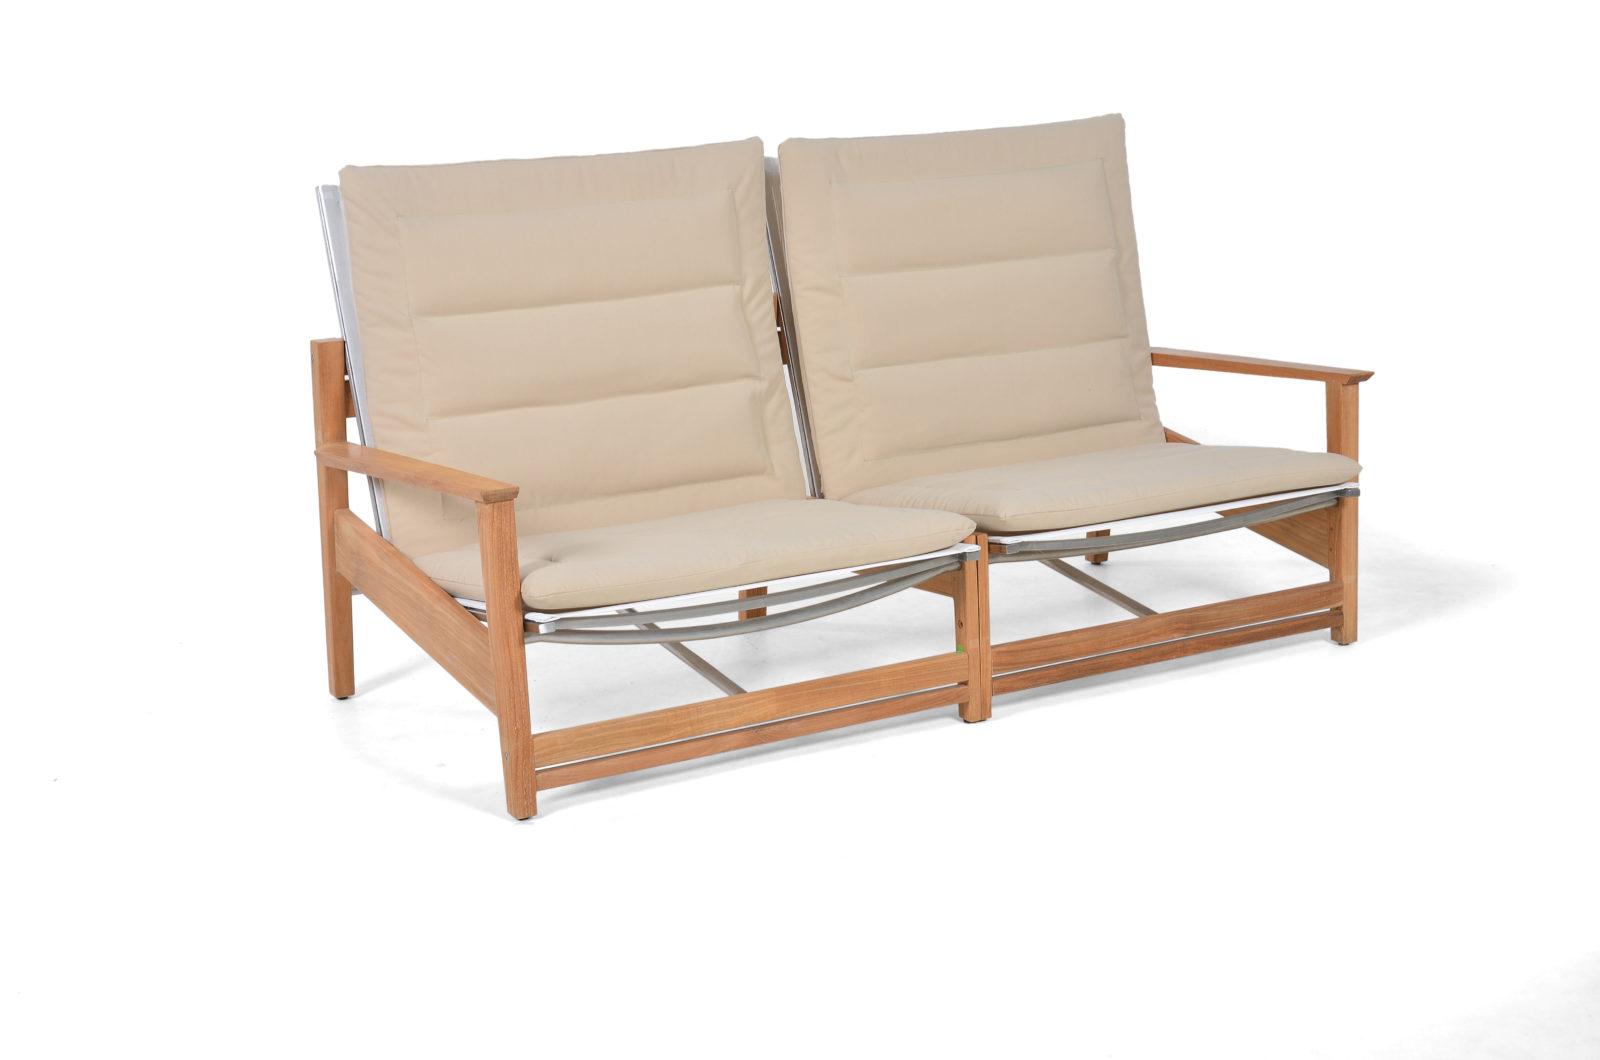 Eli 2 Seater Sofa Modern Teak Pool Terrace Lounge Furniture Hospitality